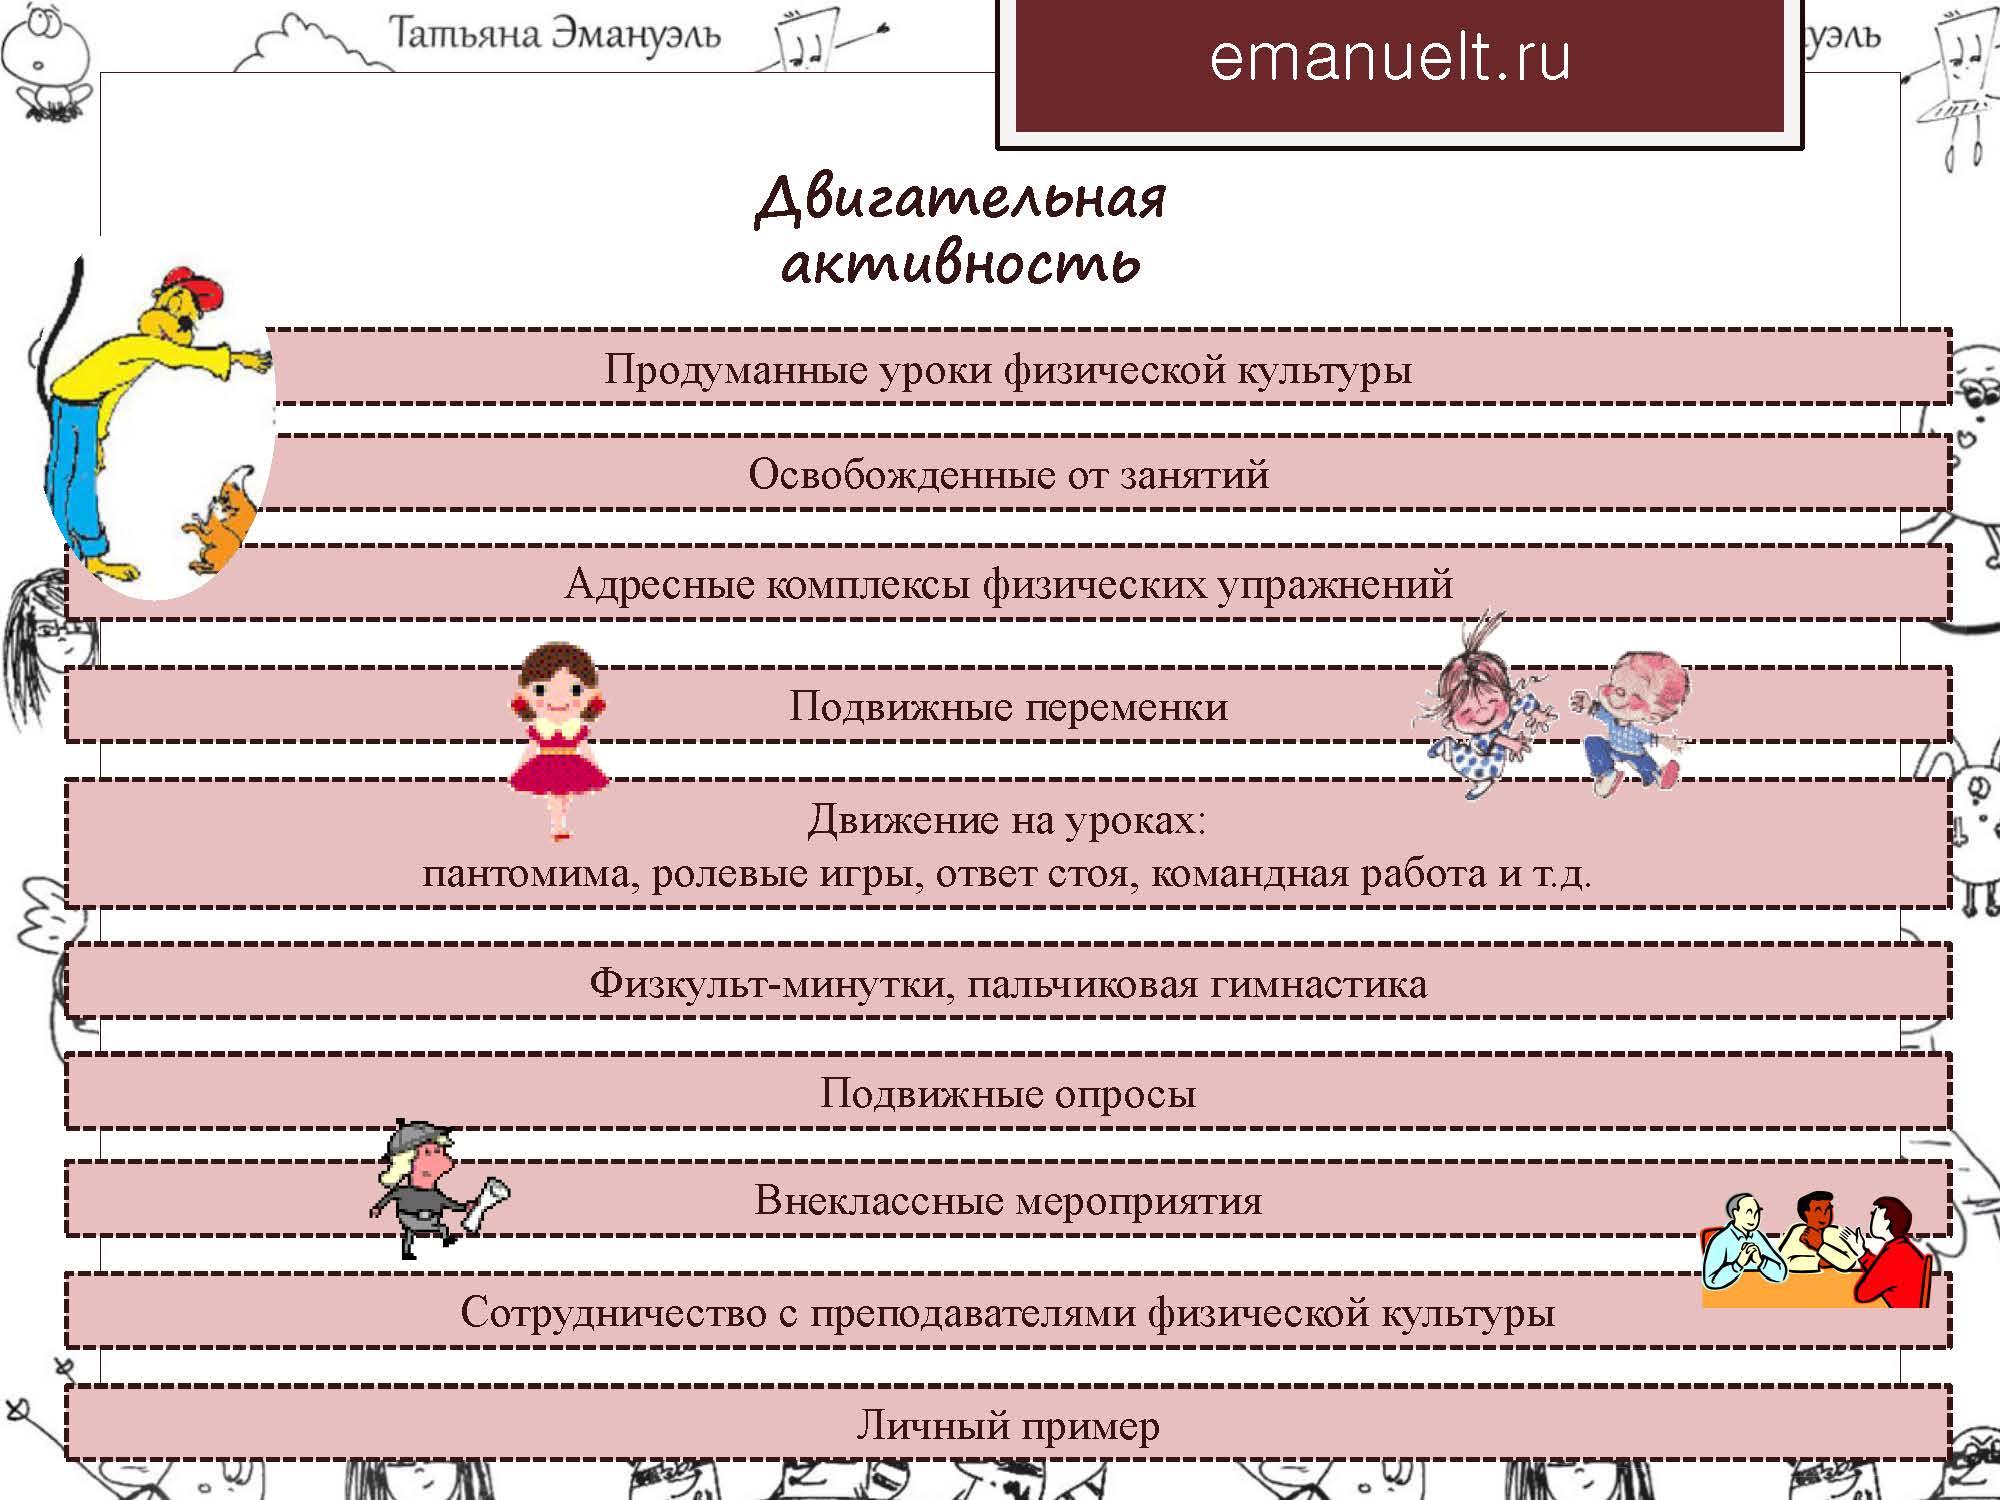 06 февраля эмануэль_Страница_074